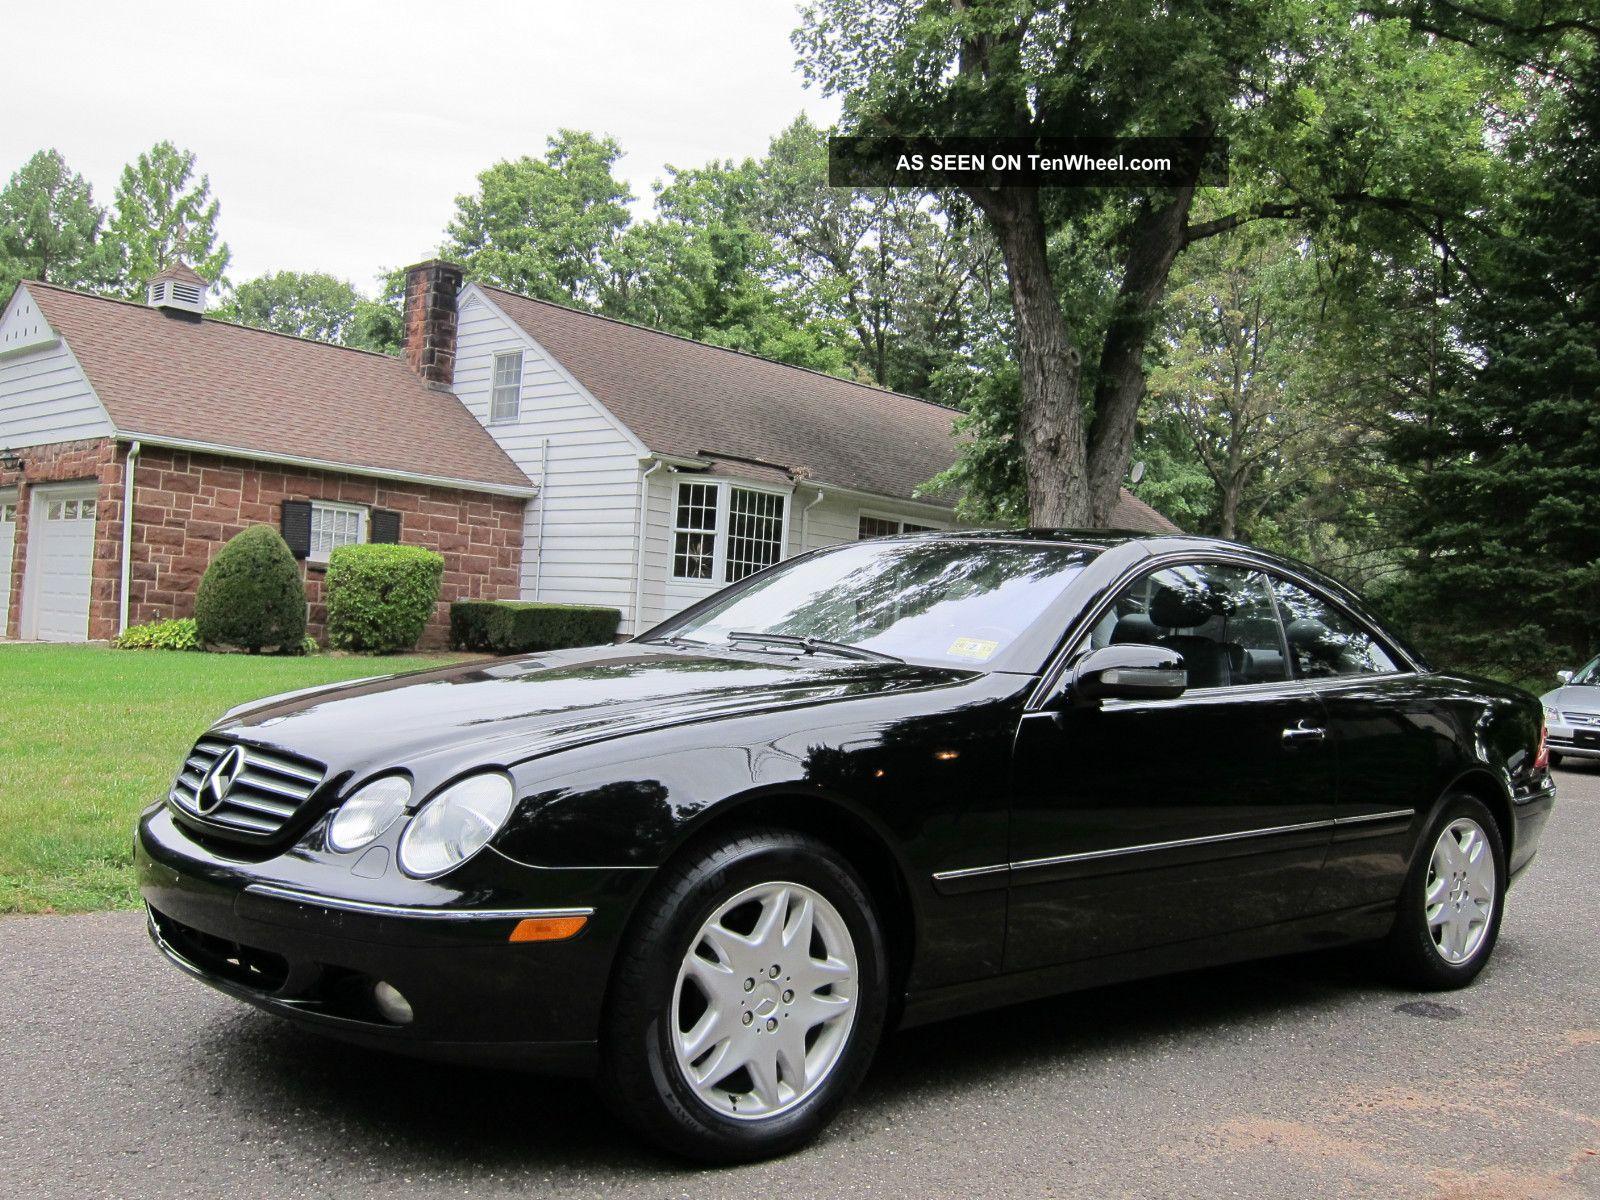 2001 Mercedes Benz Cl500 Mercedes Benz Cl500 2001 Prior